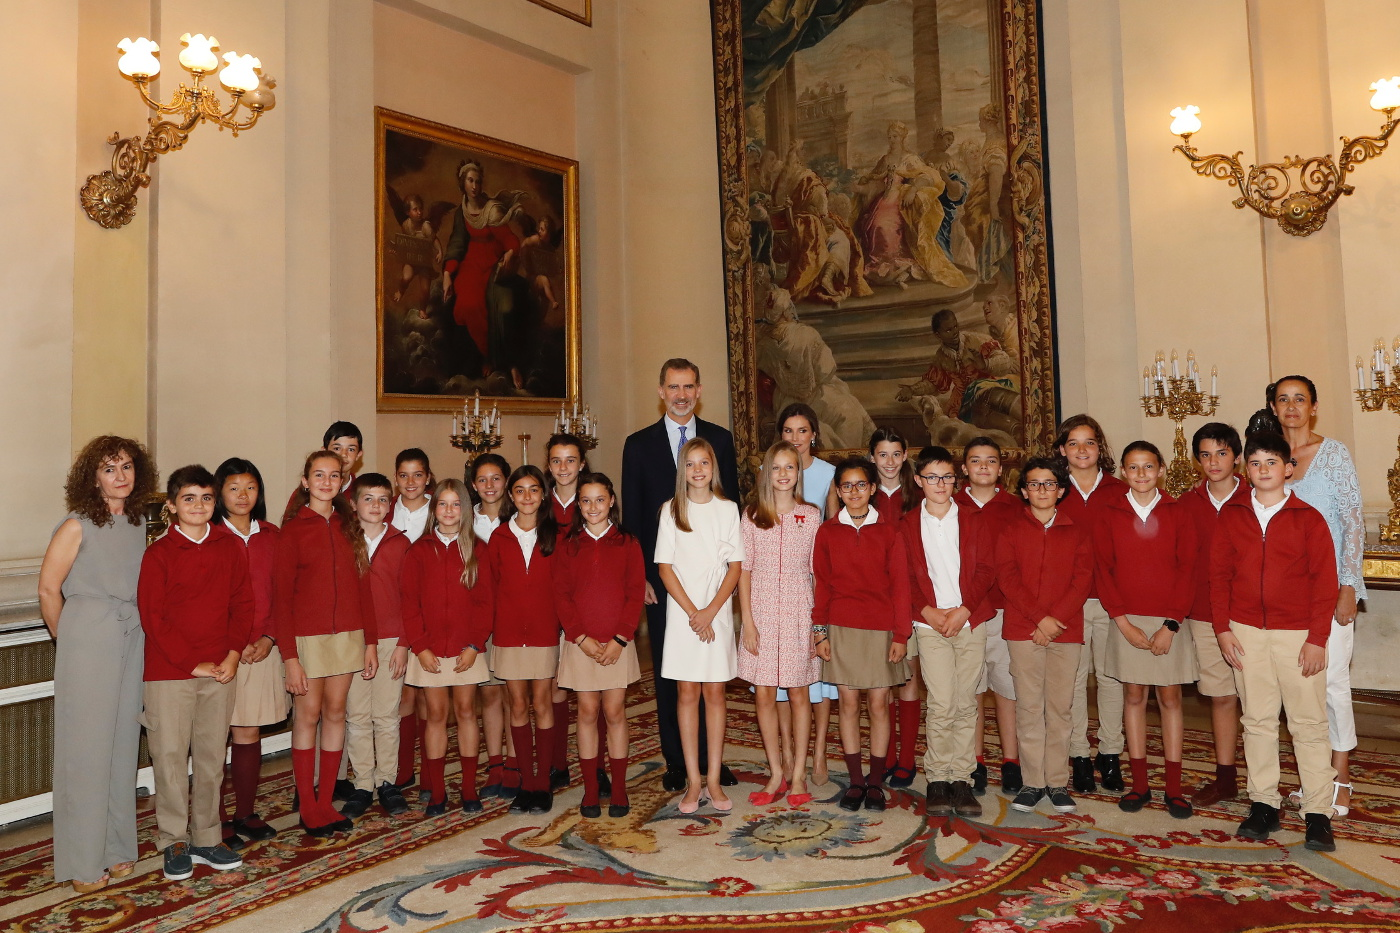 Aniversario del rey Felipe VI